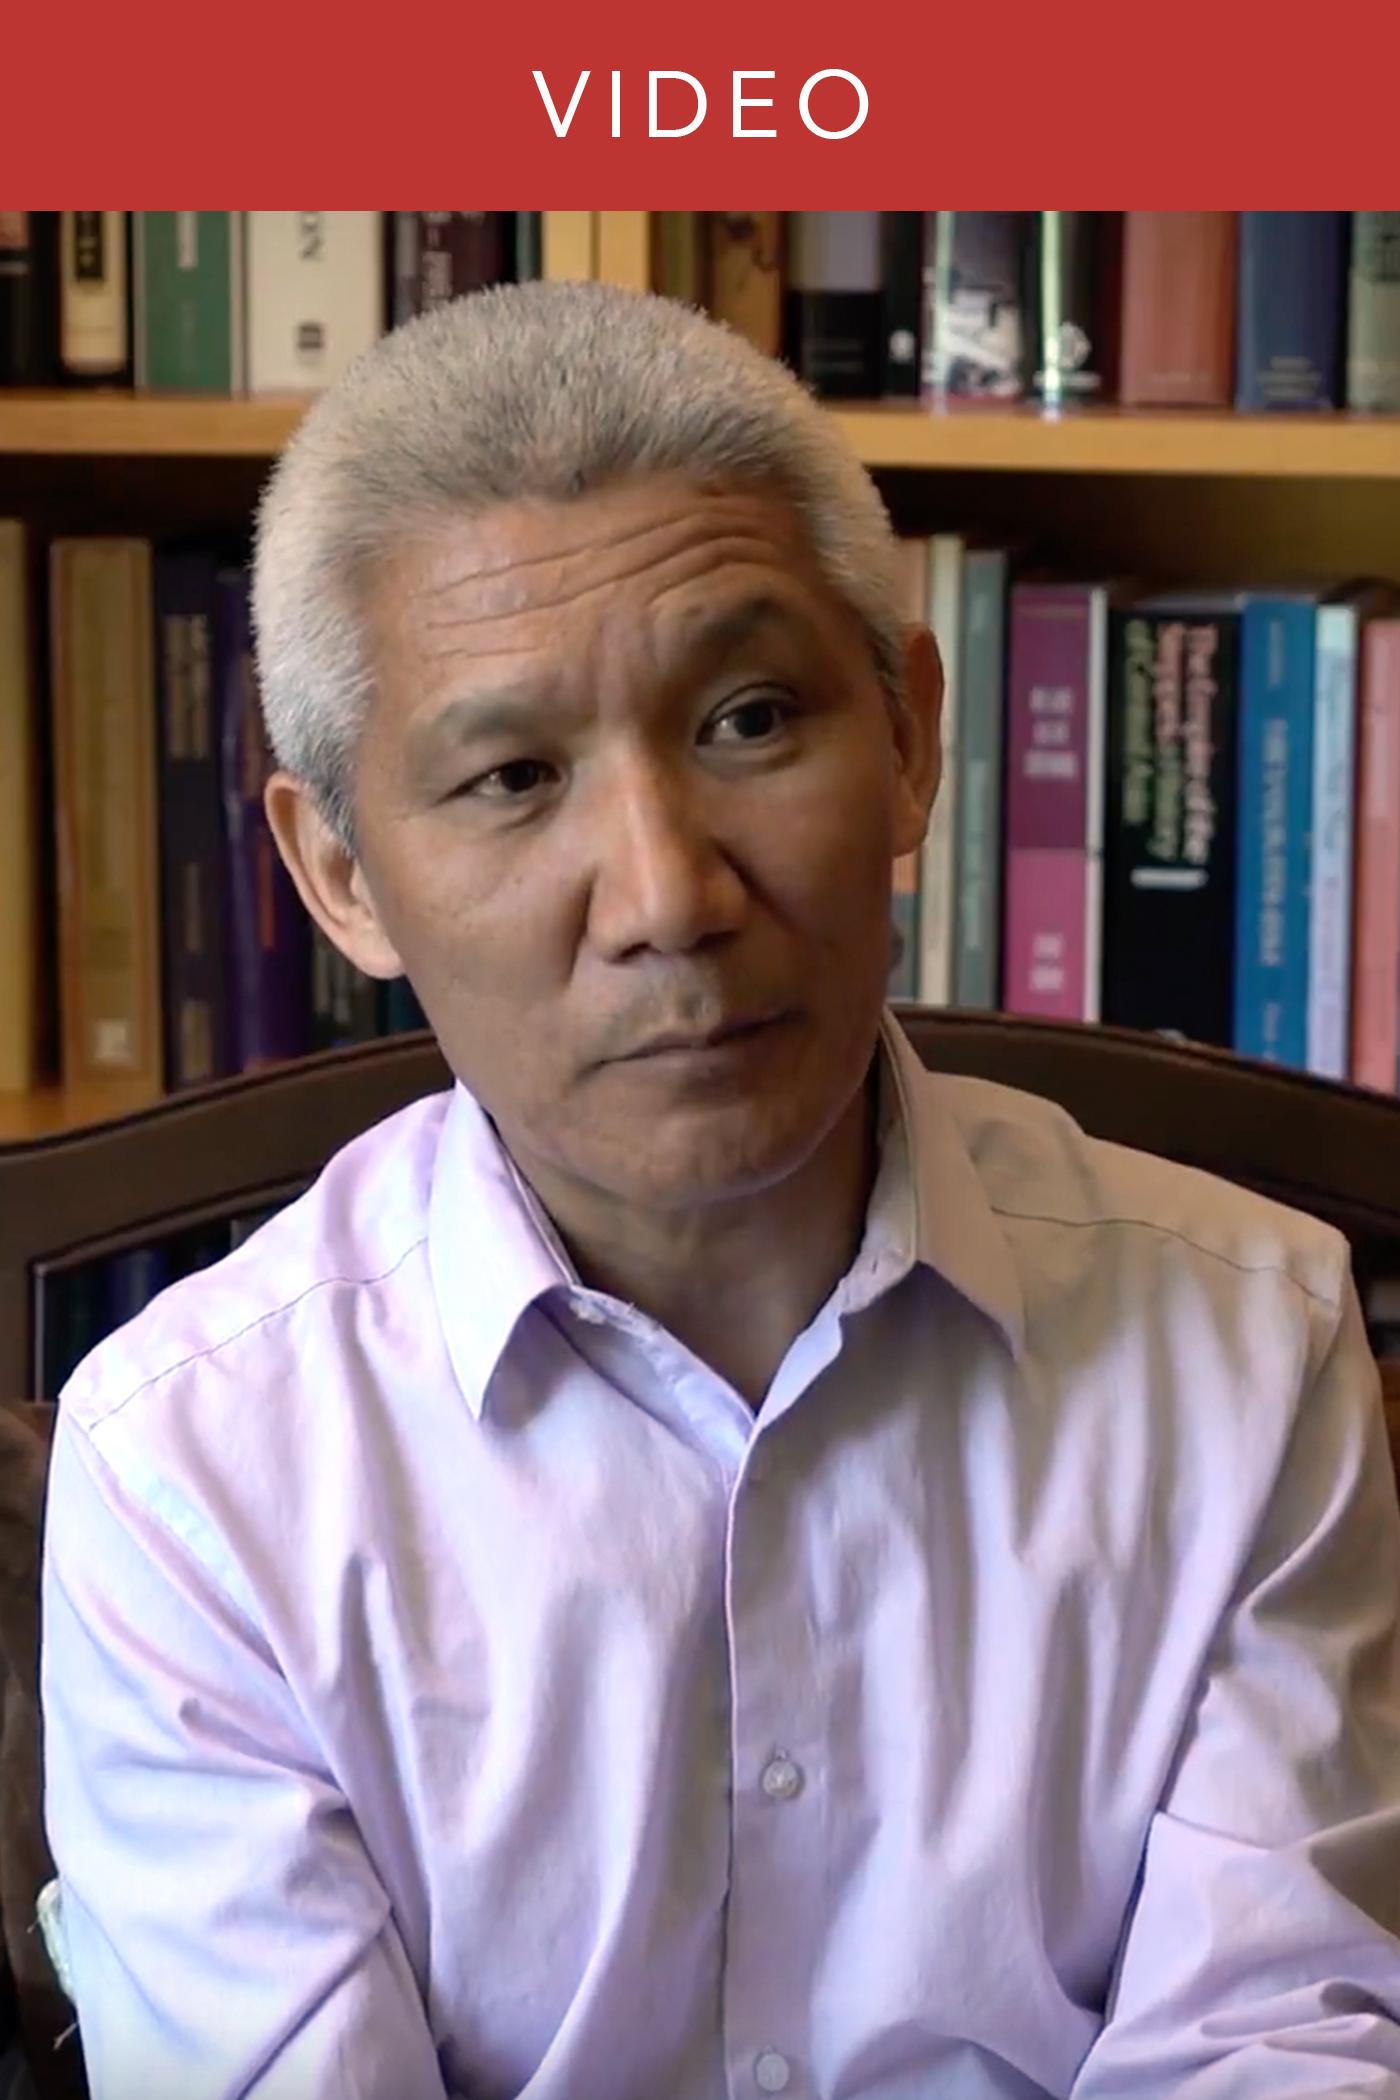 Thupten Jinpa on Debate: The Union of Shamatha and Vipashyana